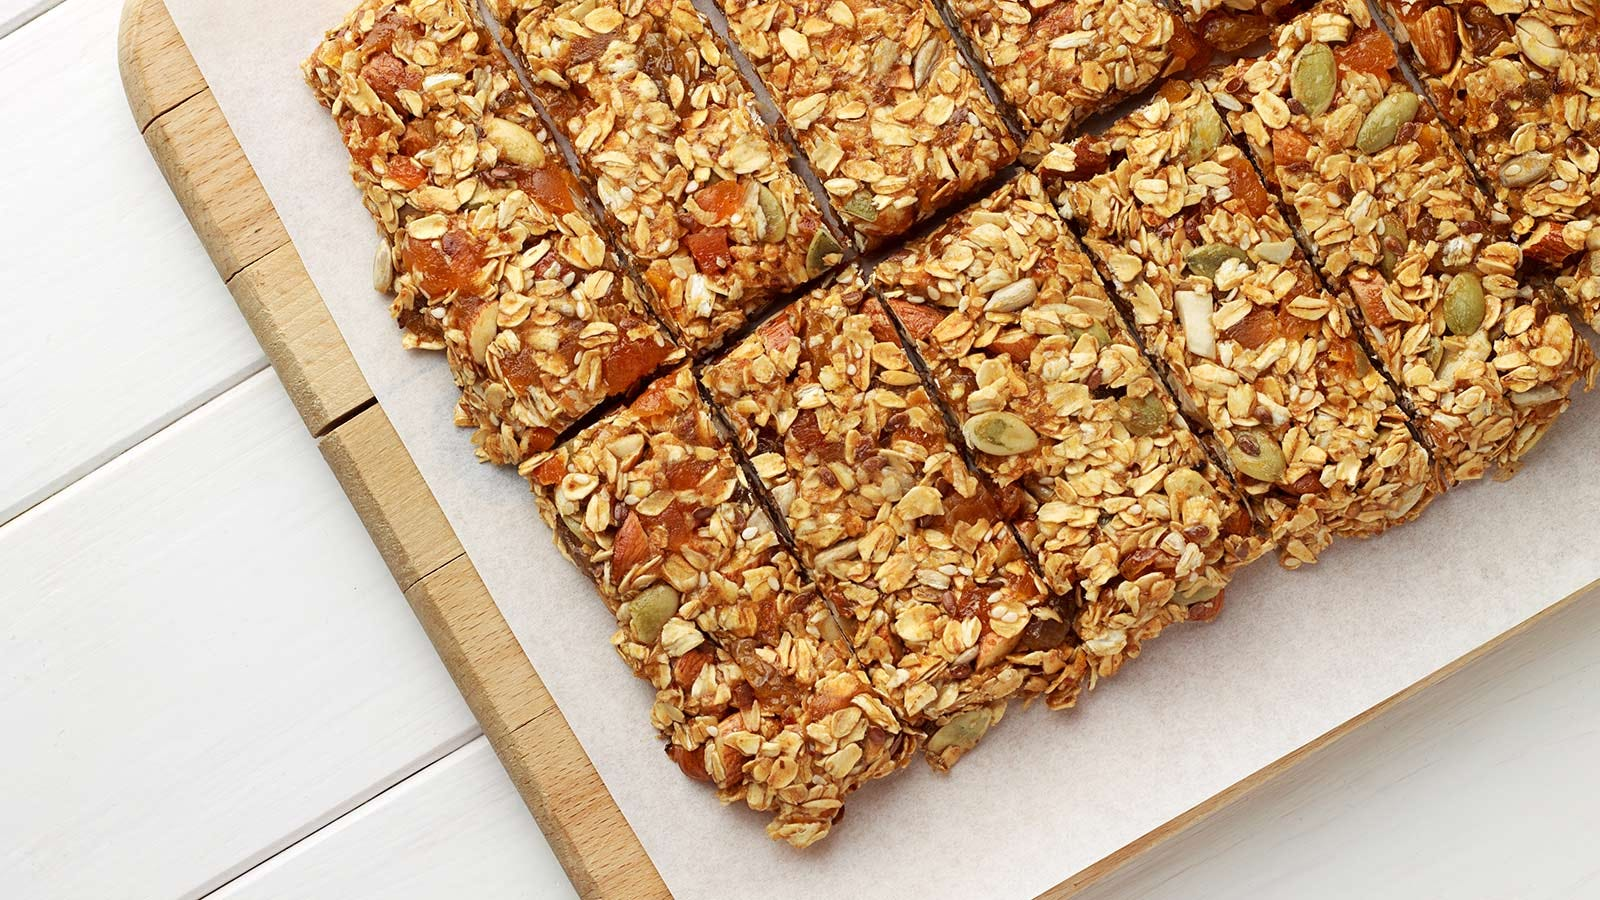 Homemade granola bars on a cutting board.